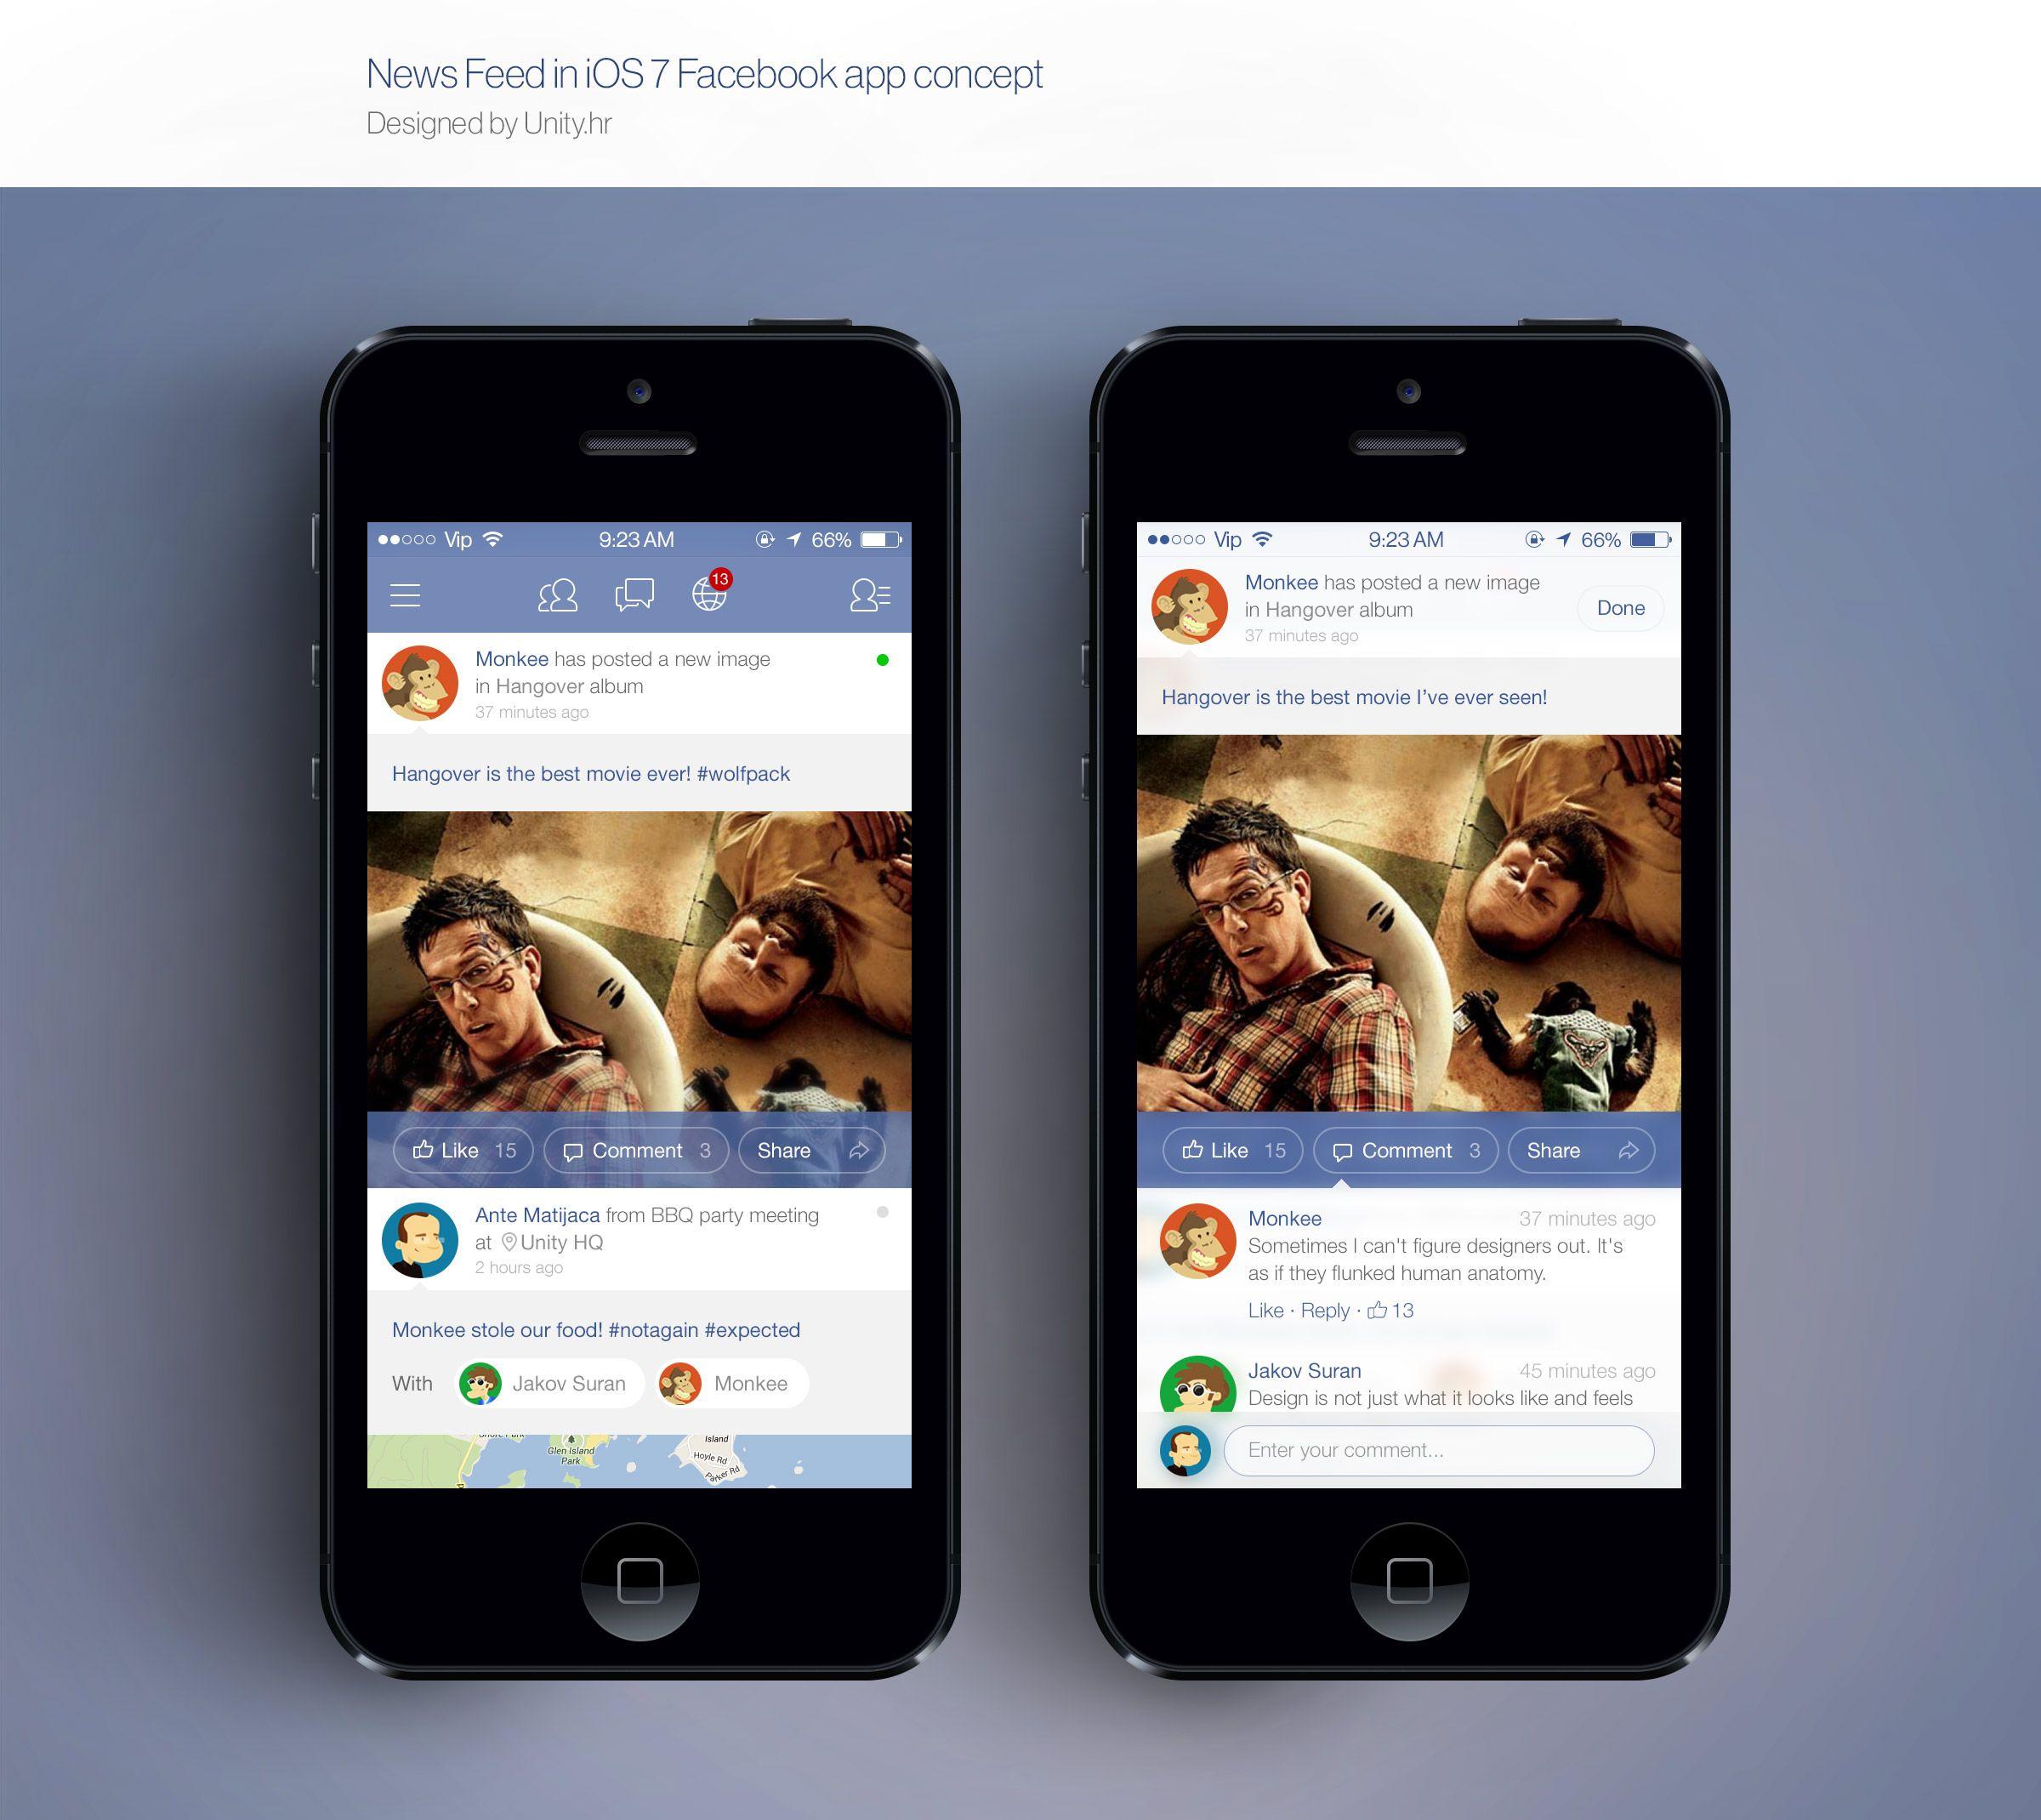 Dribbble social app ui design jpg by ramotion - Facebook Ios 7 News Feed